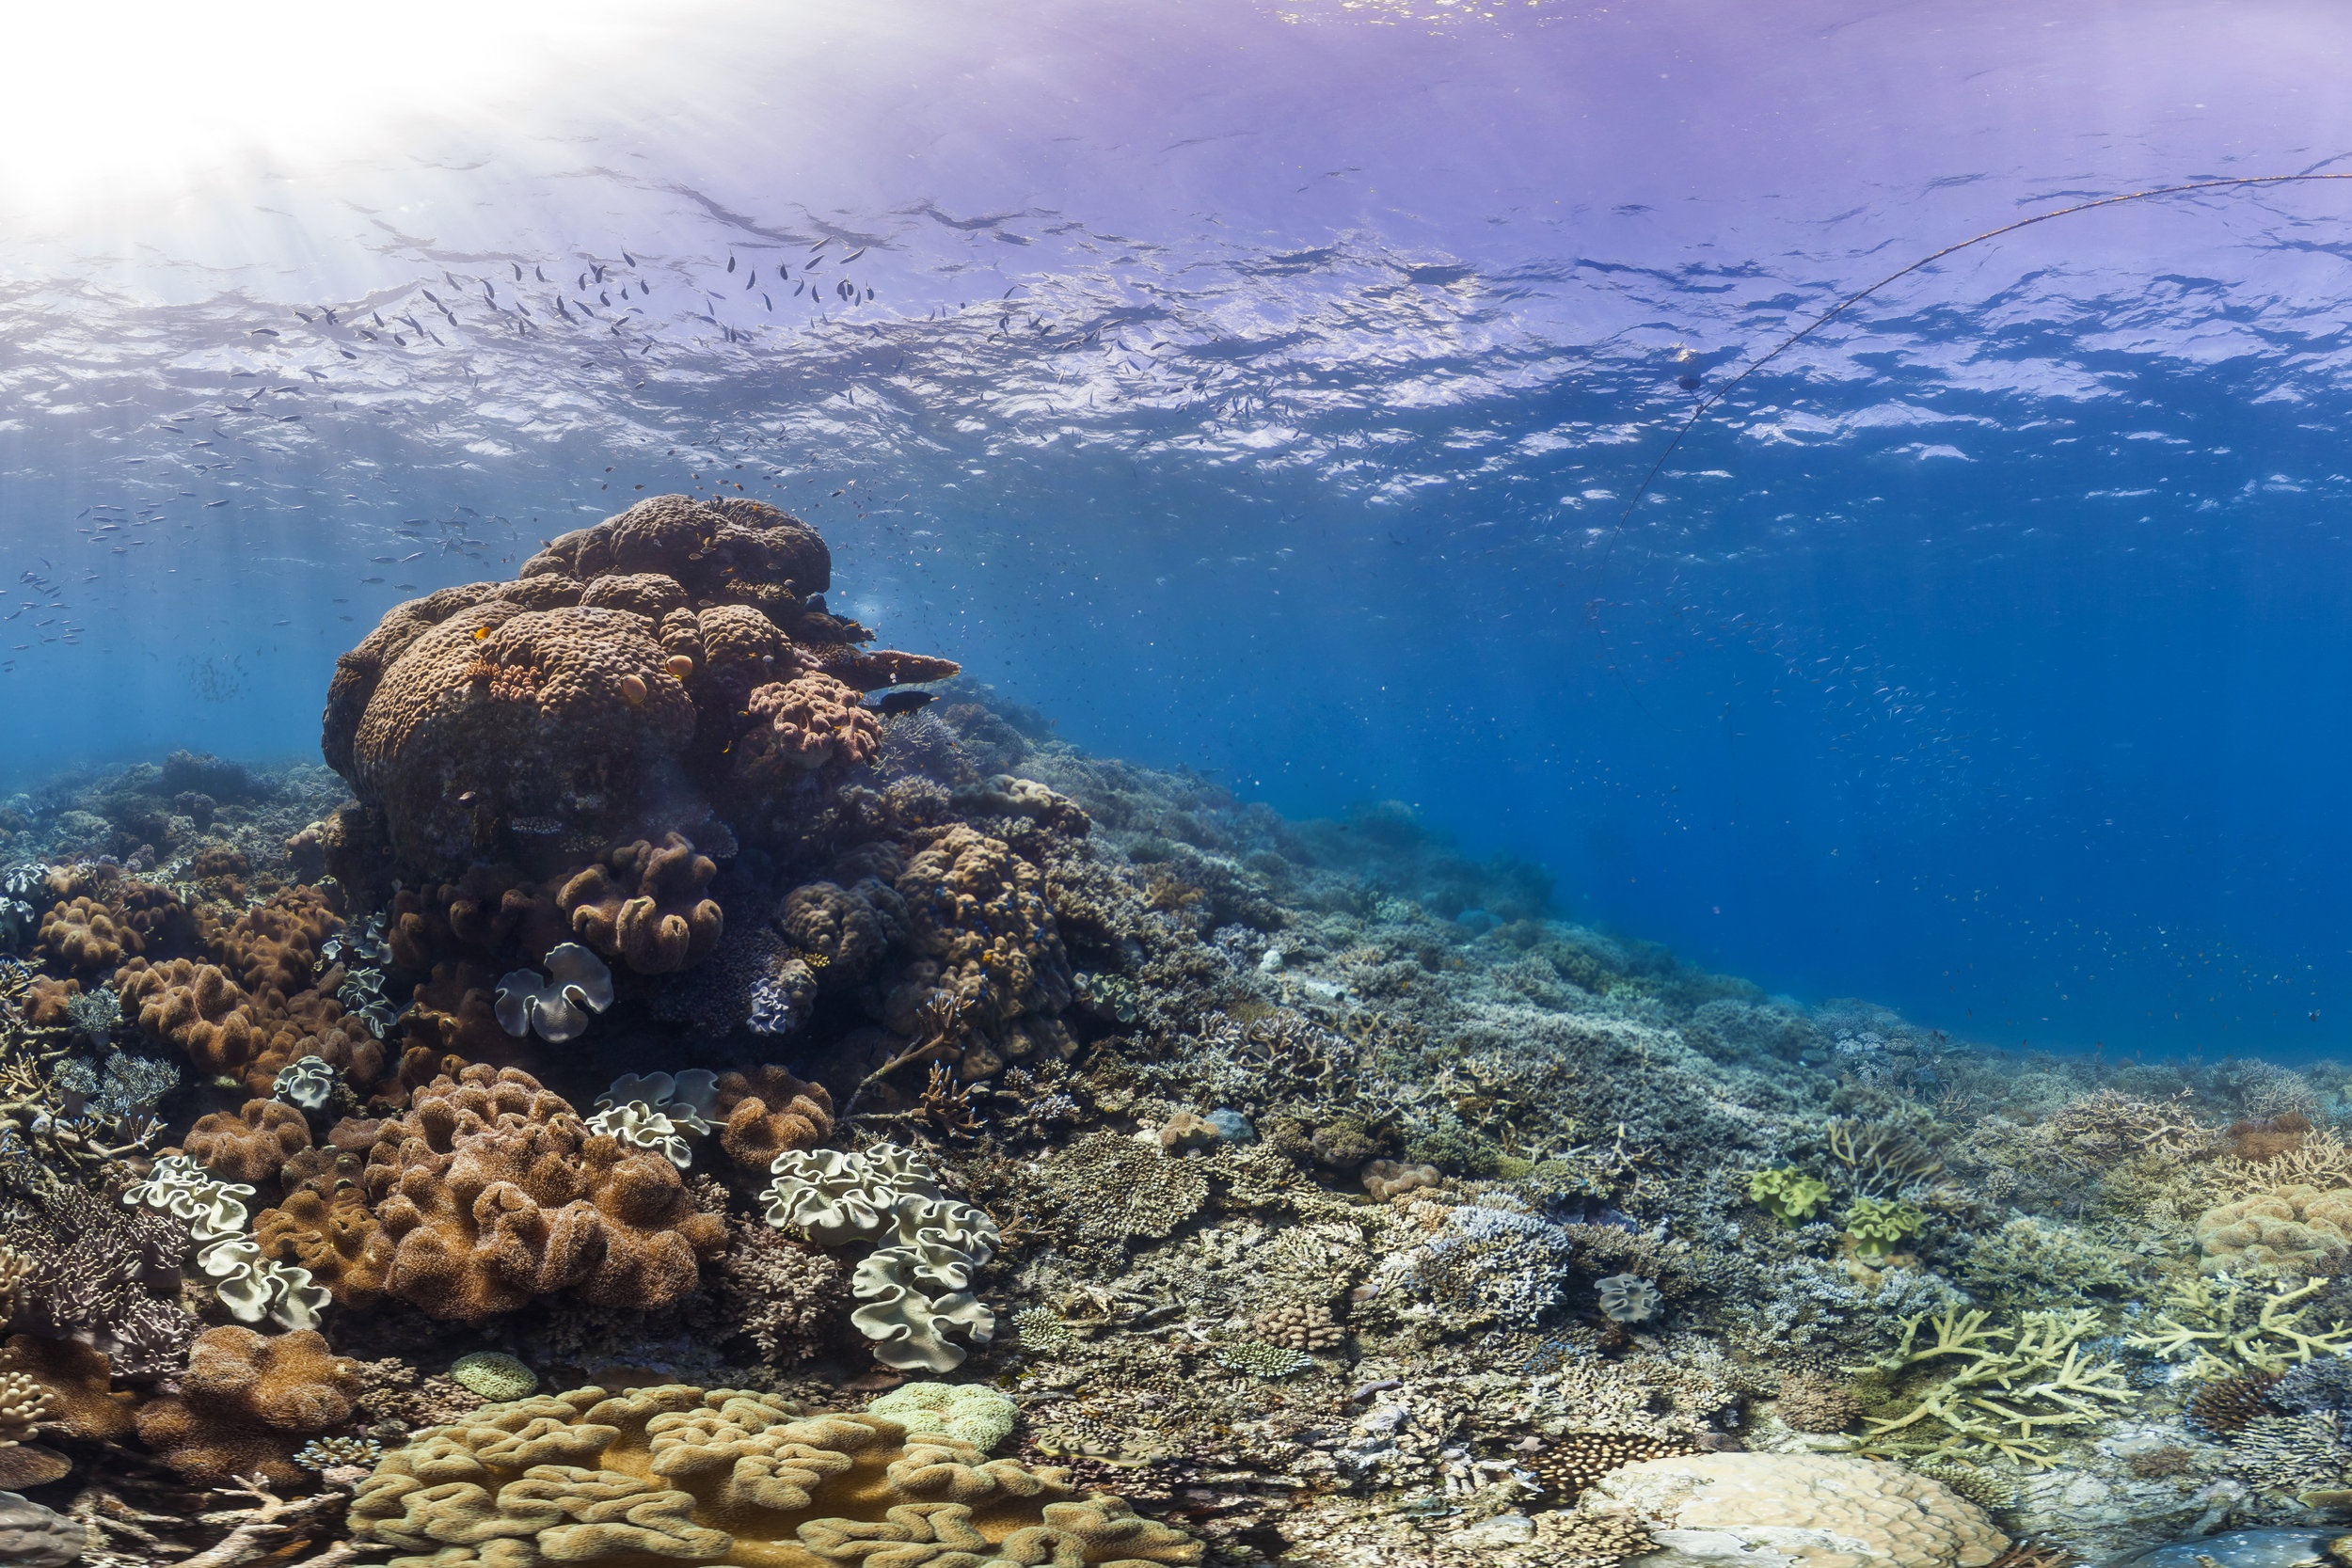 DESTIN REEF, Great barrier reef CREDIT: THE OCEAN AGENCY / XL CATLIN SEAVIEW SURVEY